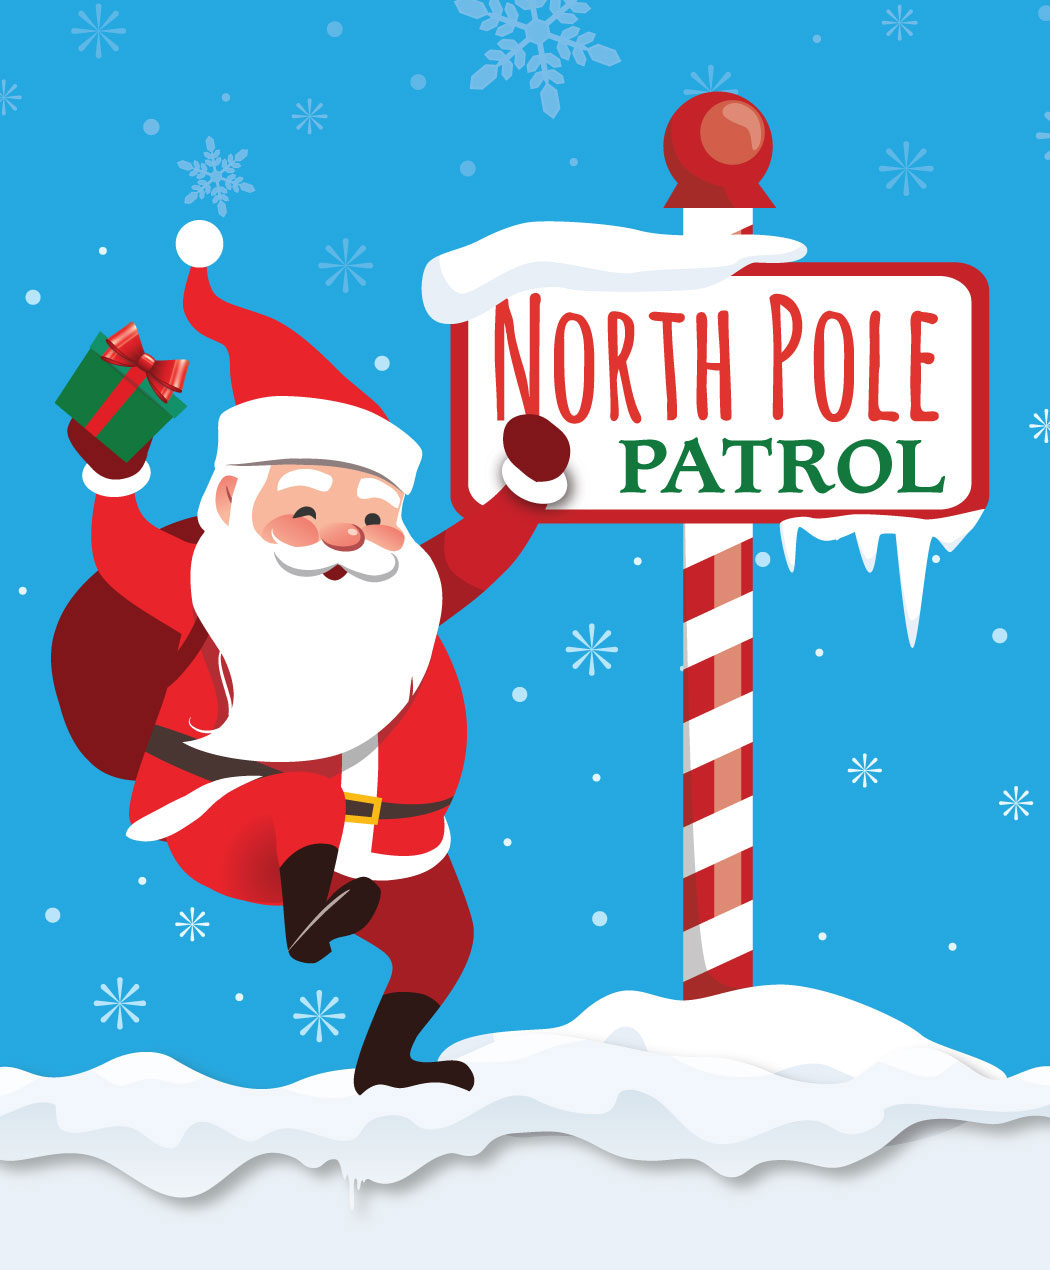 North Pole Patrol